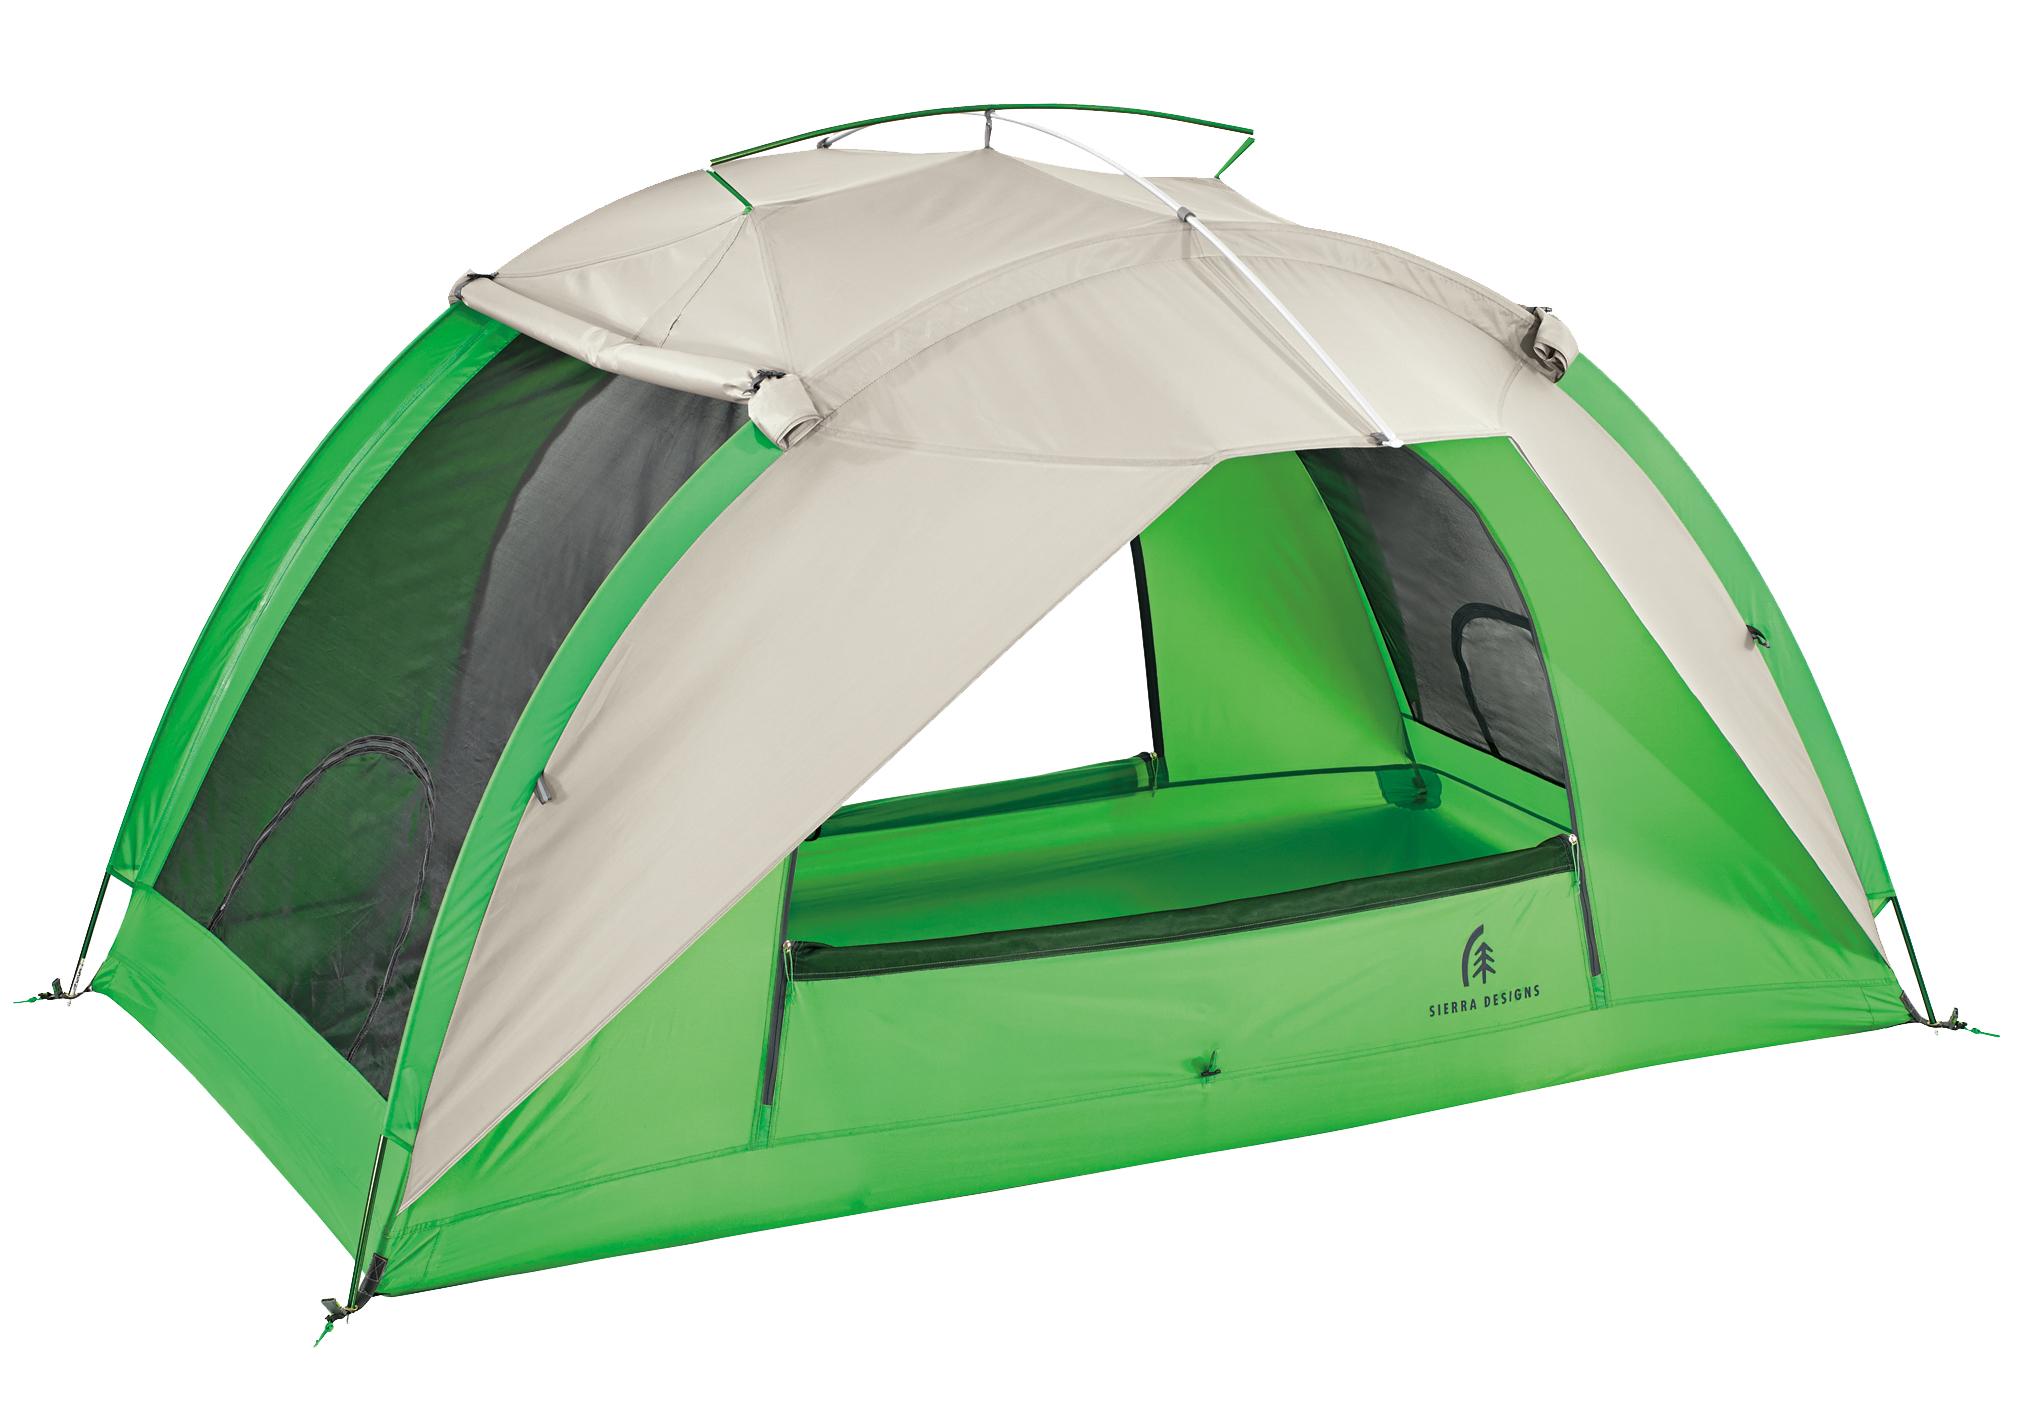 sc 1 st  MEC & Sierra Designs Flash 2 Tent